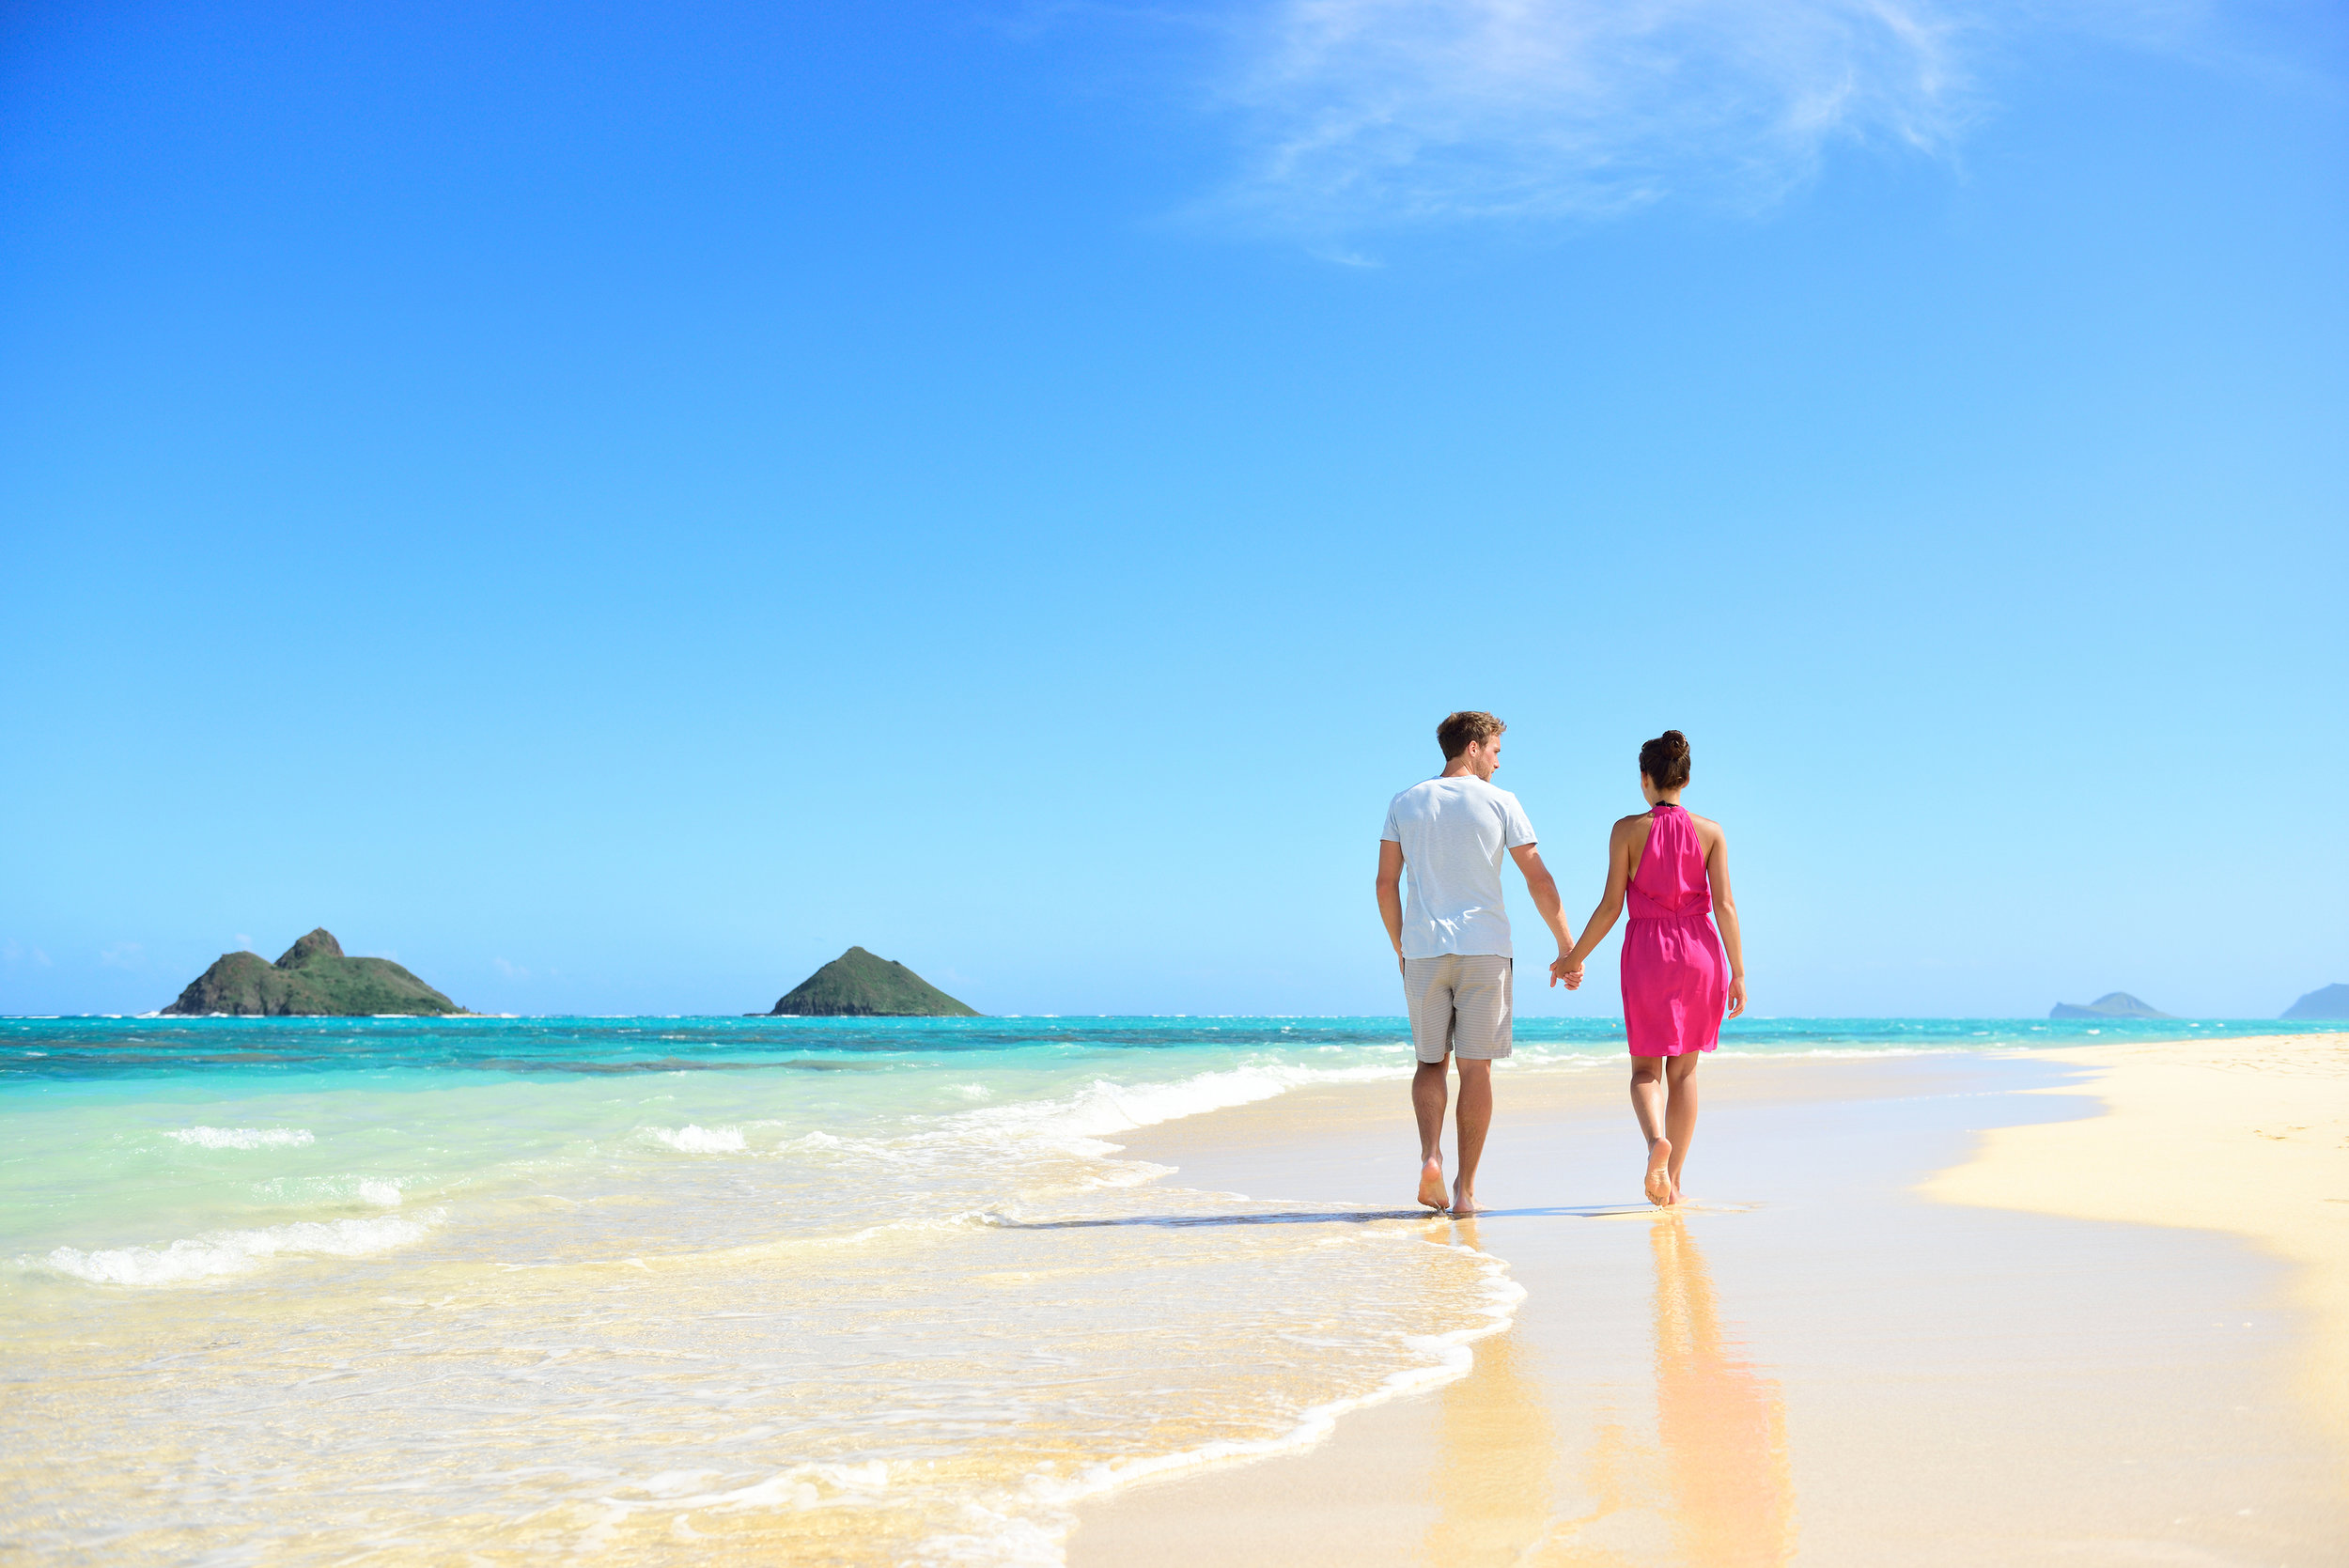 bigstock-Beach-honeymoon-couple-holding-90030590.jpg